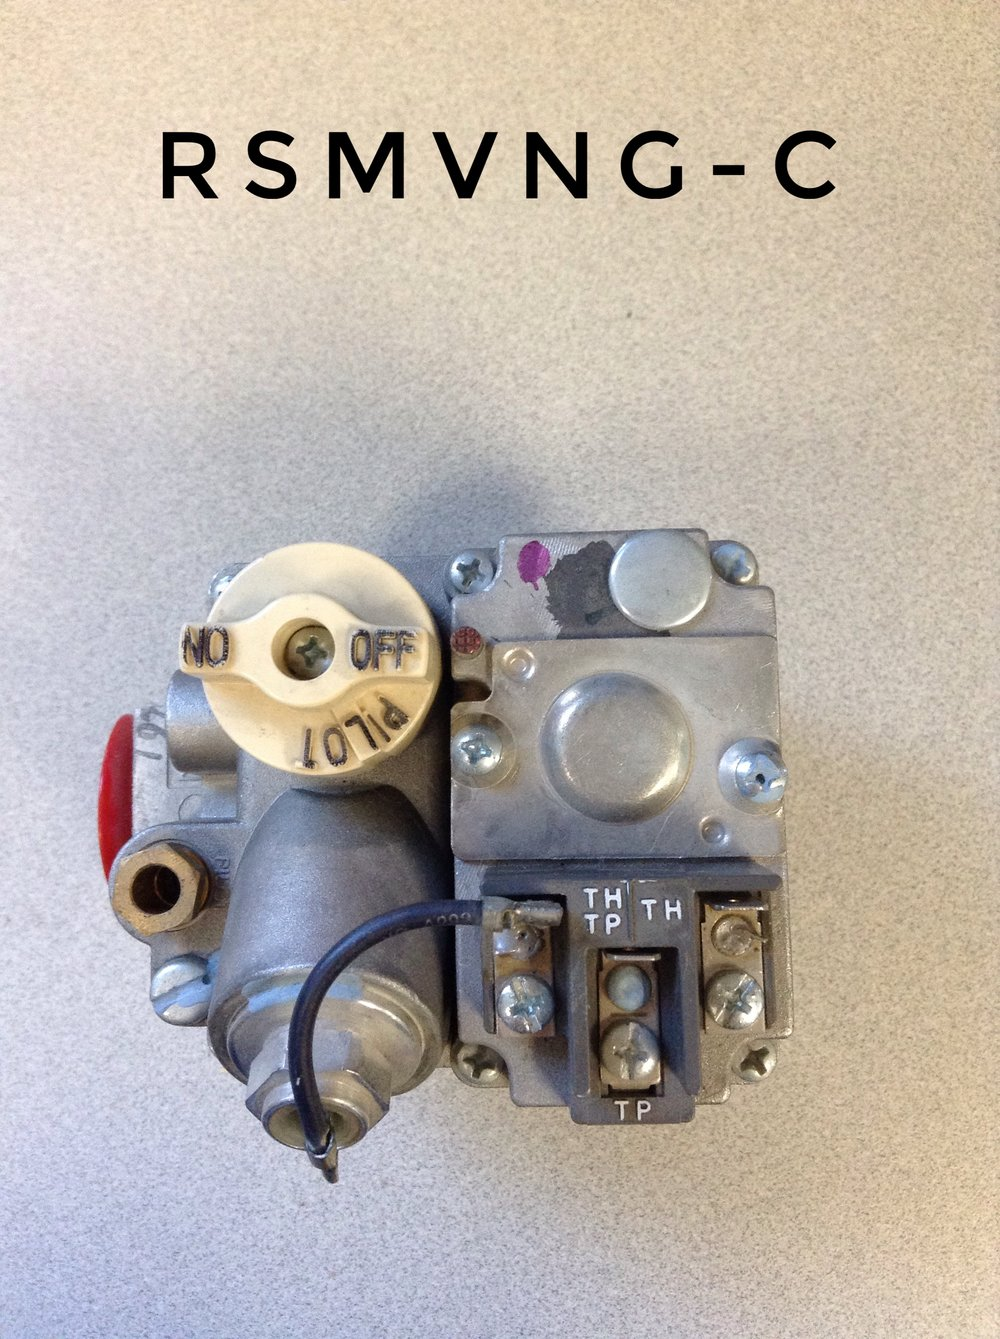 RSMVNG-C.JPG